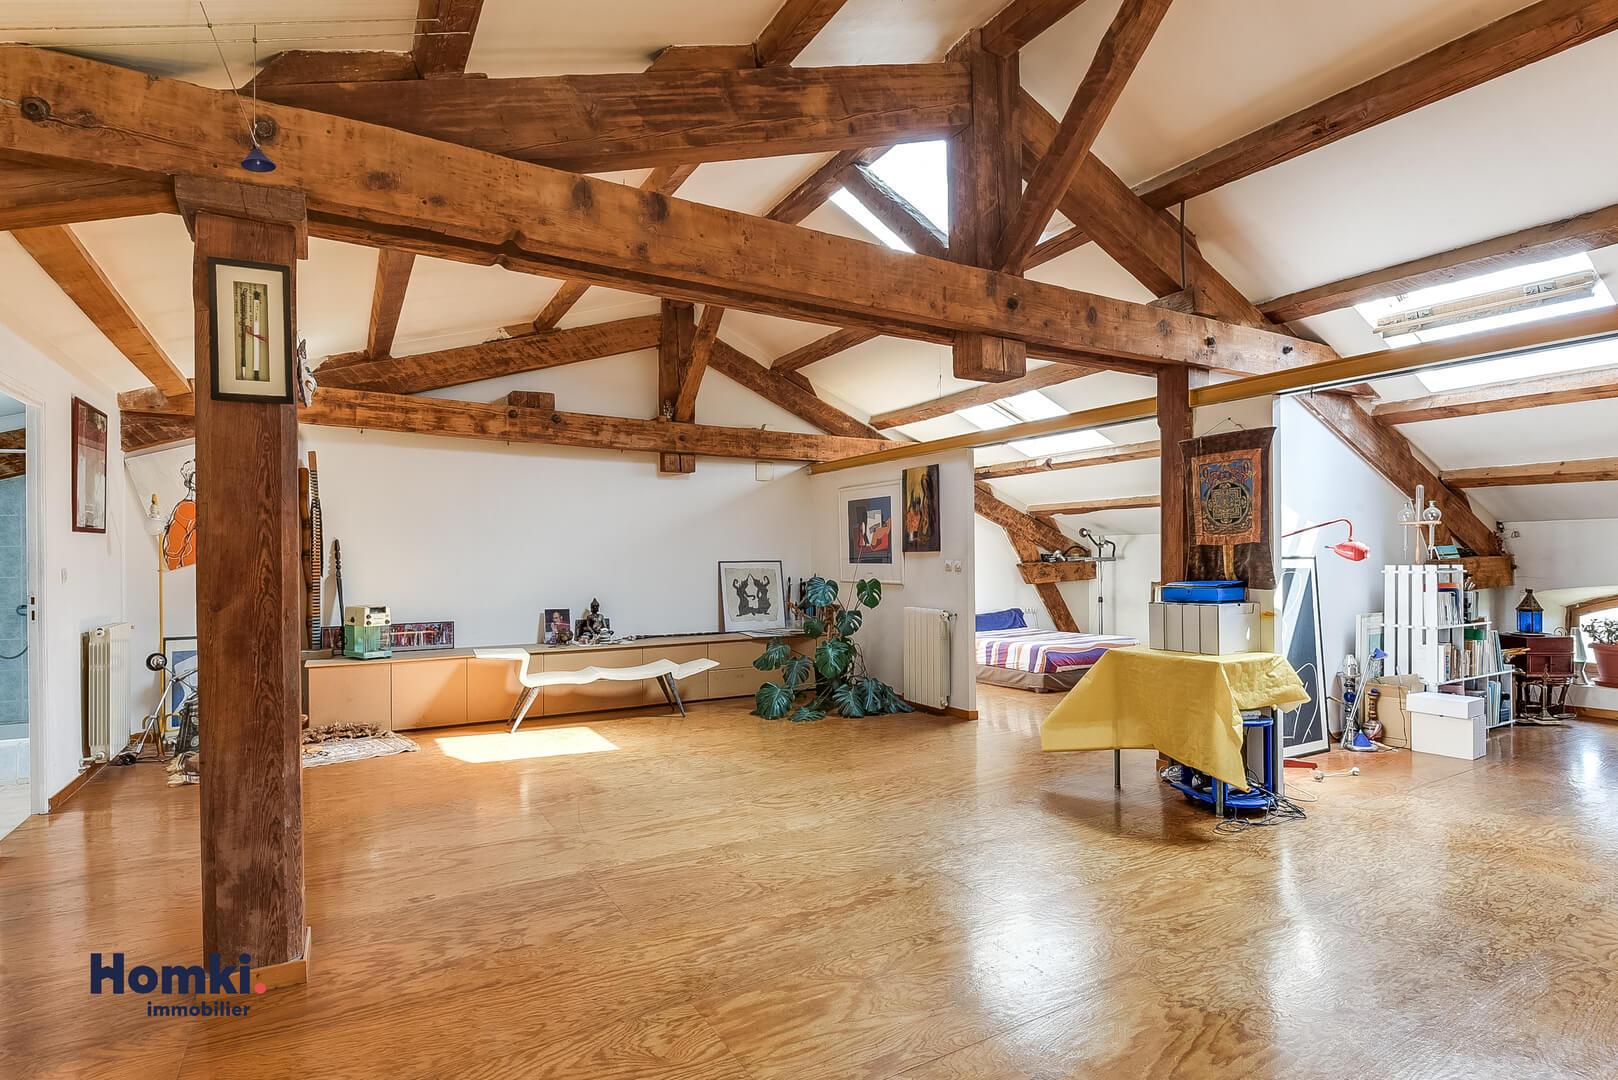 Vente loft Marseille T3 13013 130m²_3